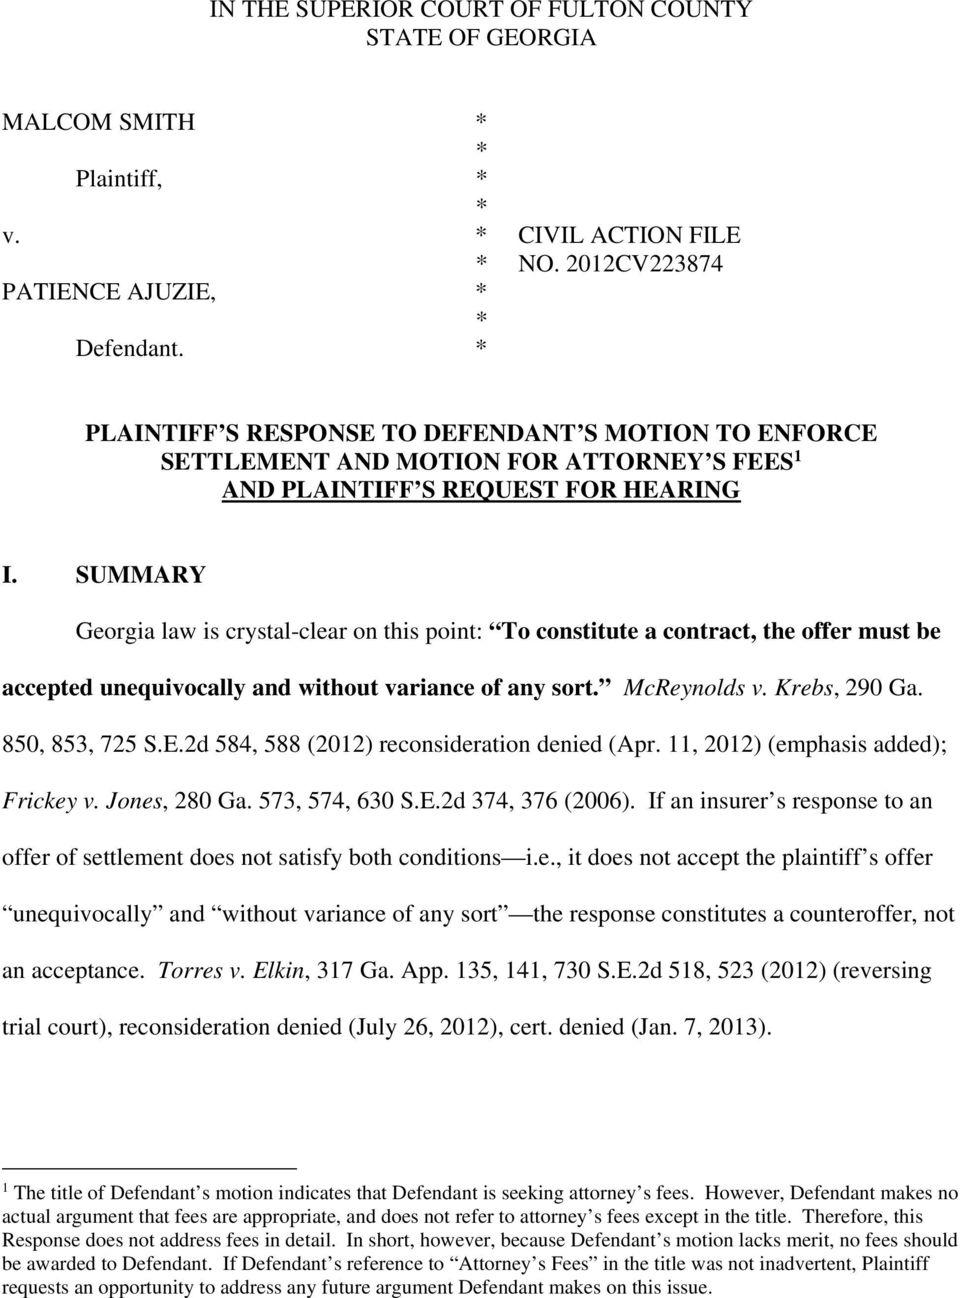 Fulton County Georgia Superior Court Filing Fees